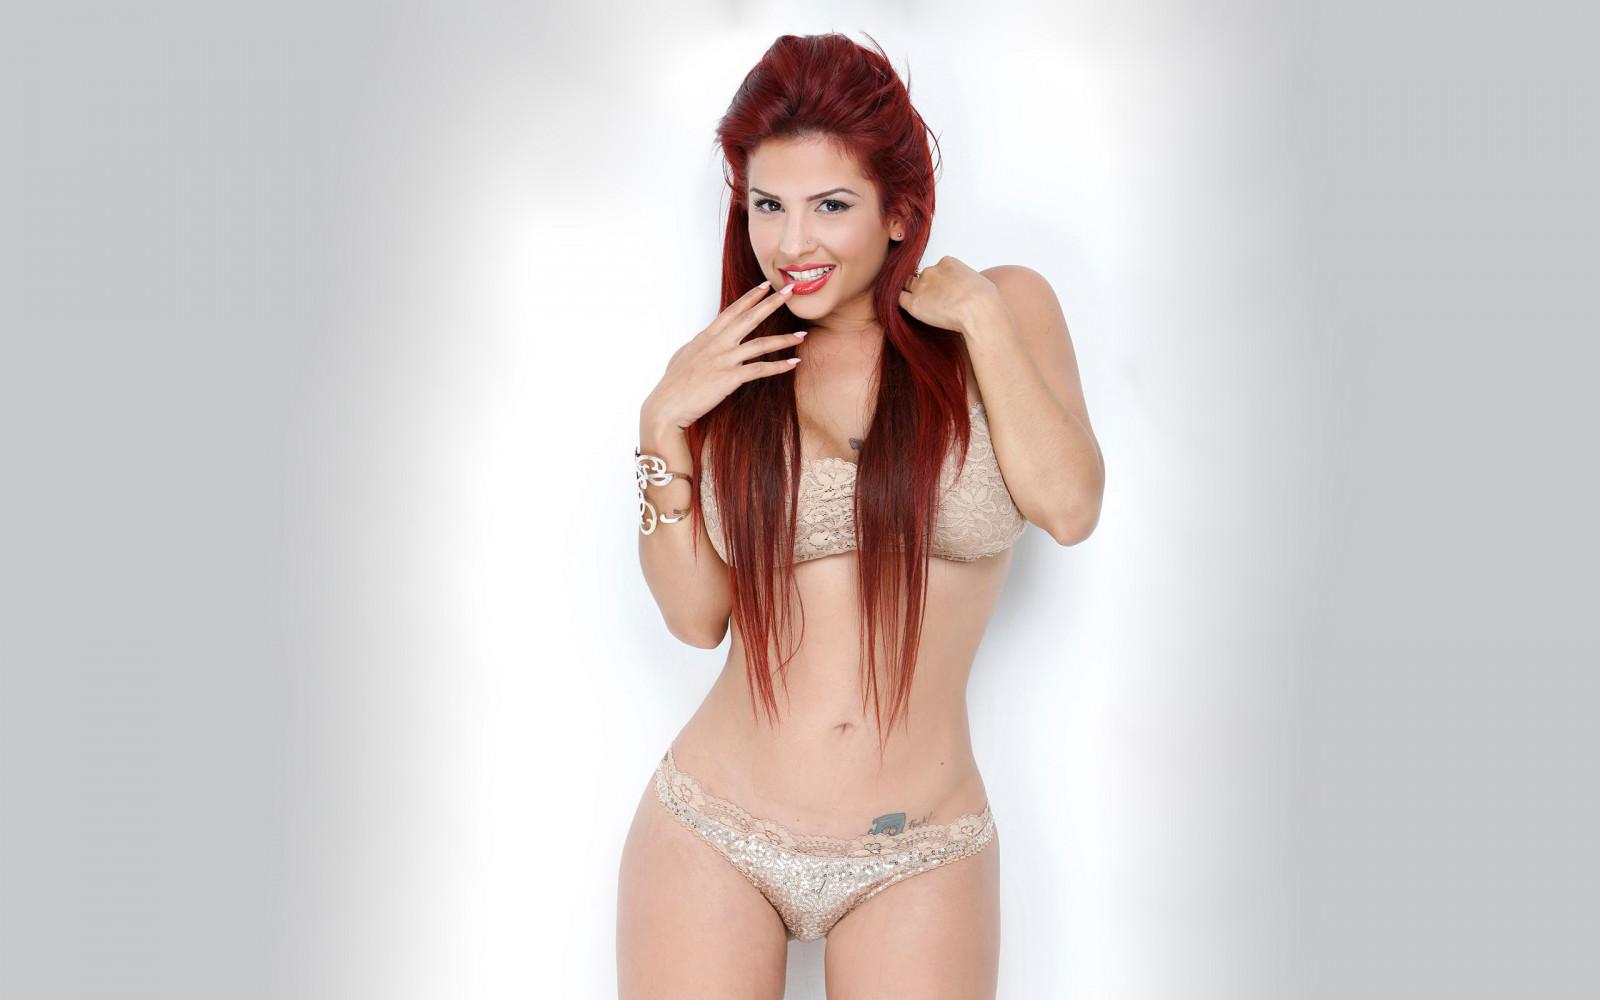 nude-red-bone-white-girls-eroticlactation-gif